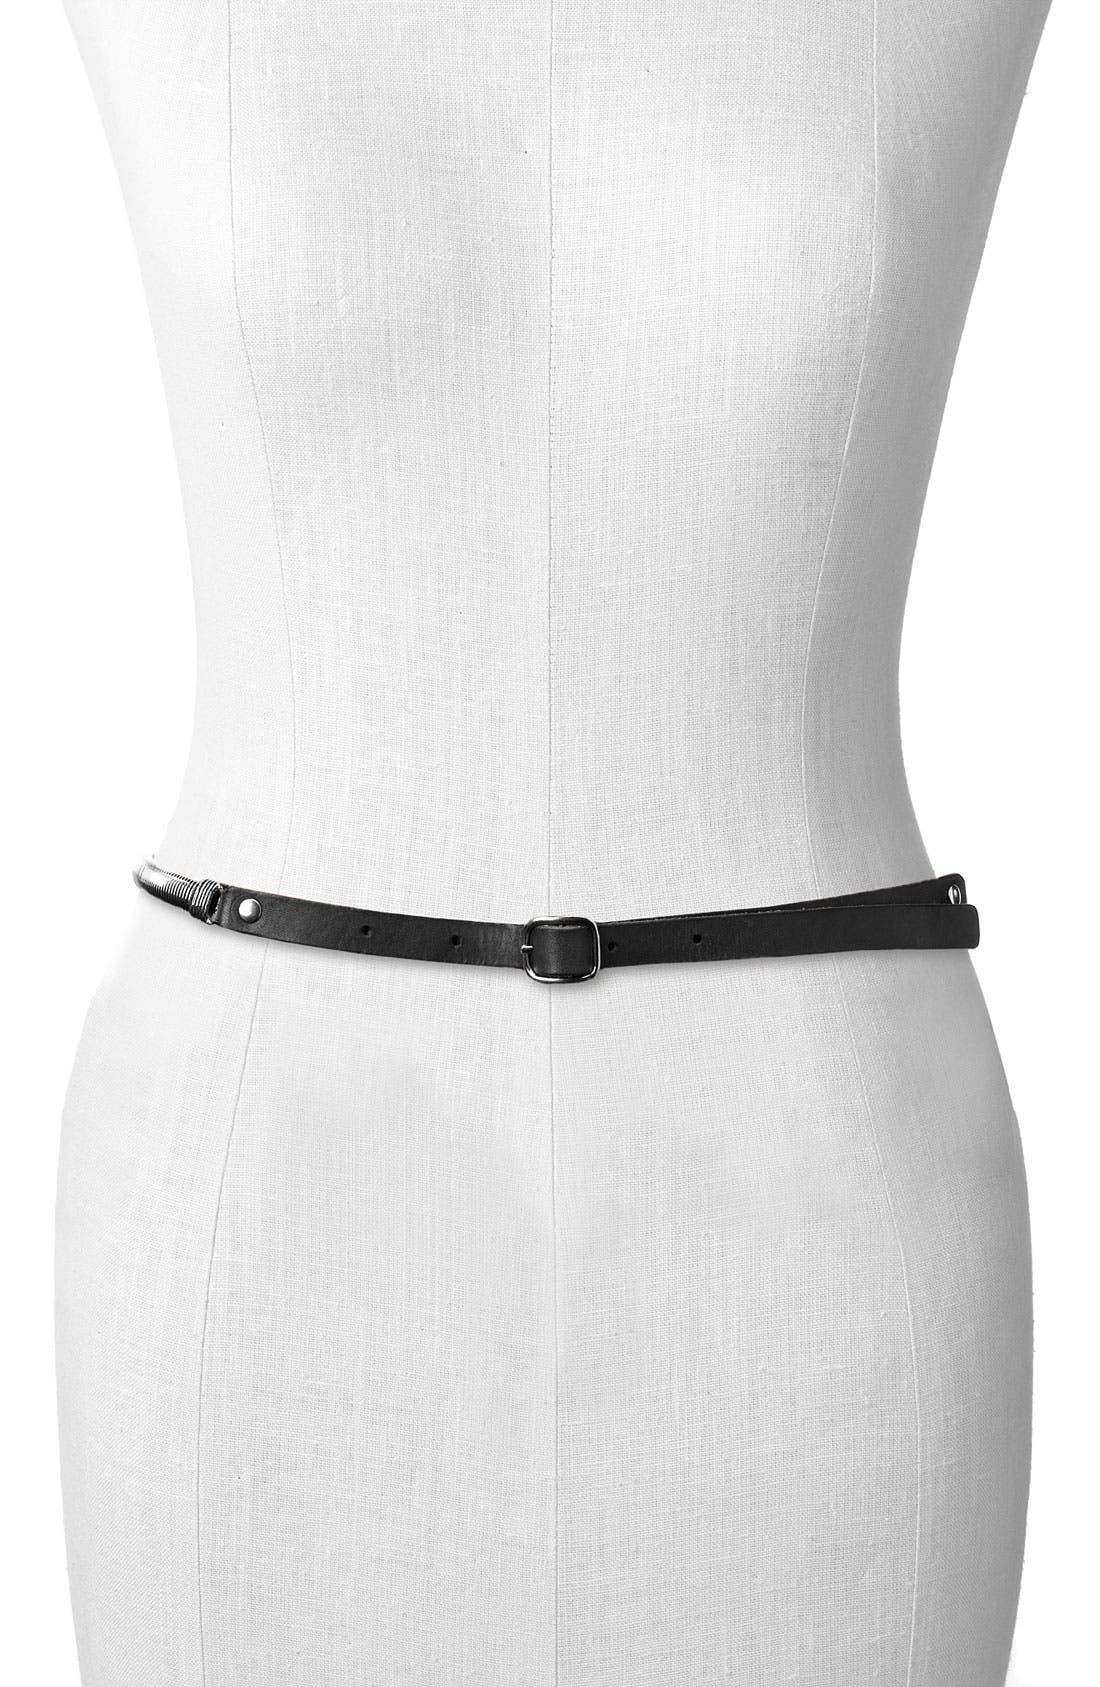 Main Image - Belgo Lux 'Metal Stretch' Skinny Belt